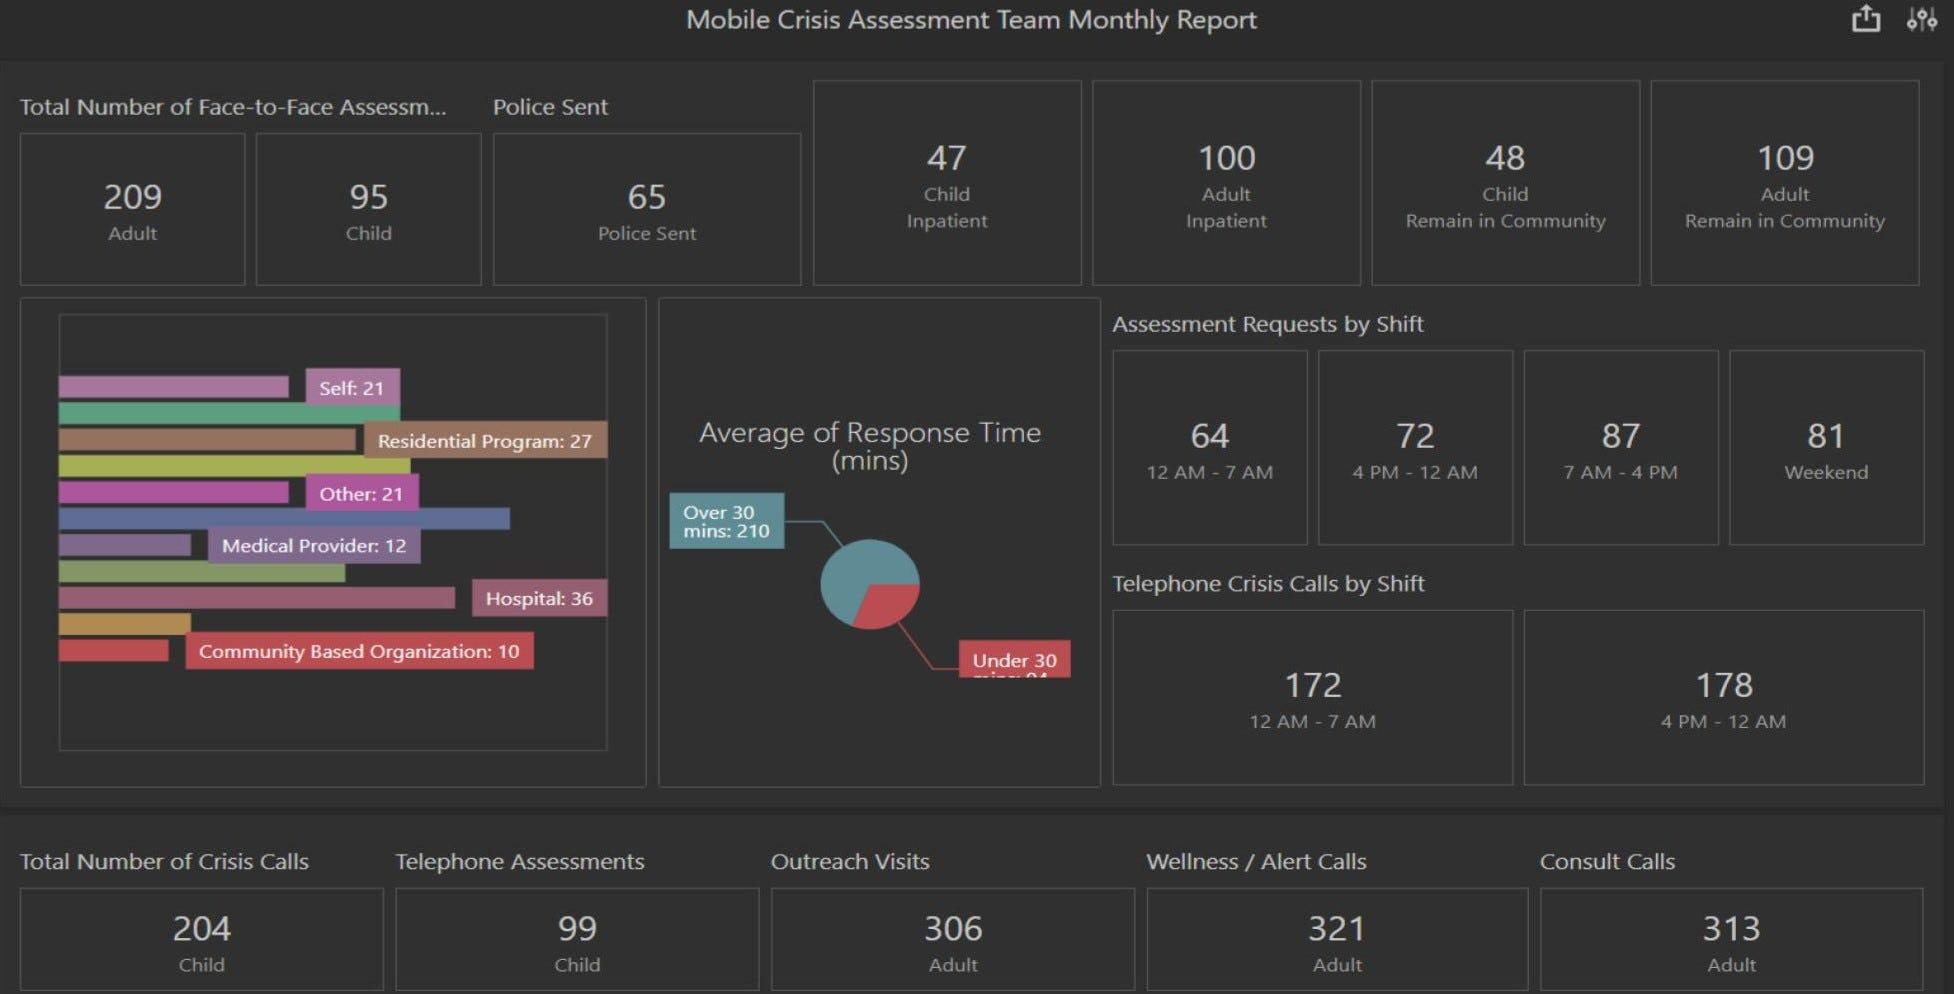 NextStep Software - Mobile Crisis Dashboard